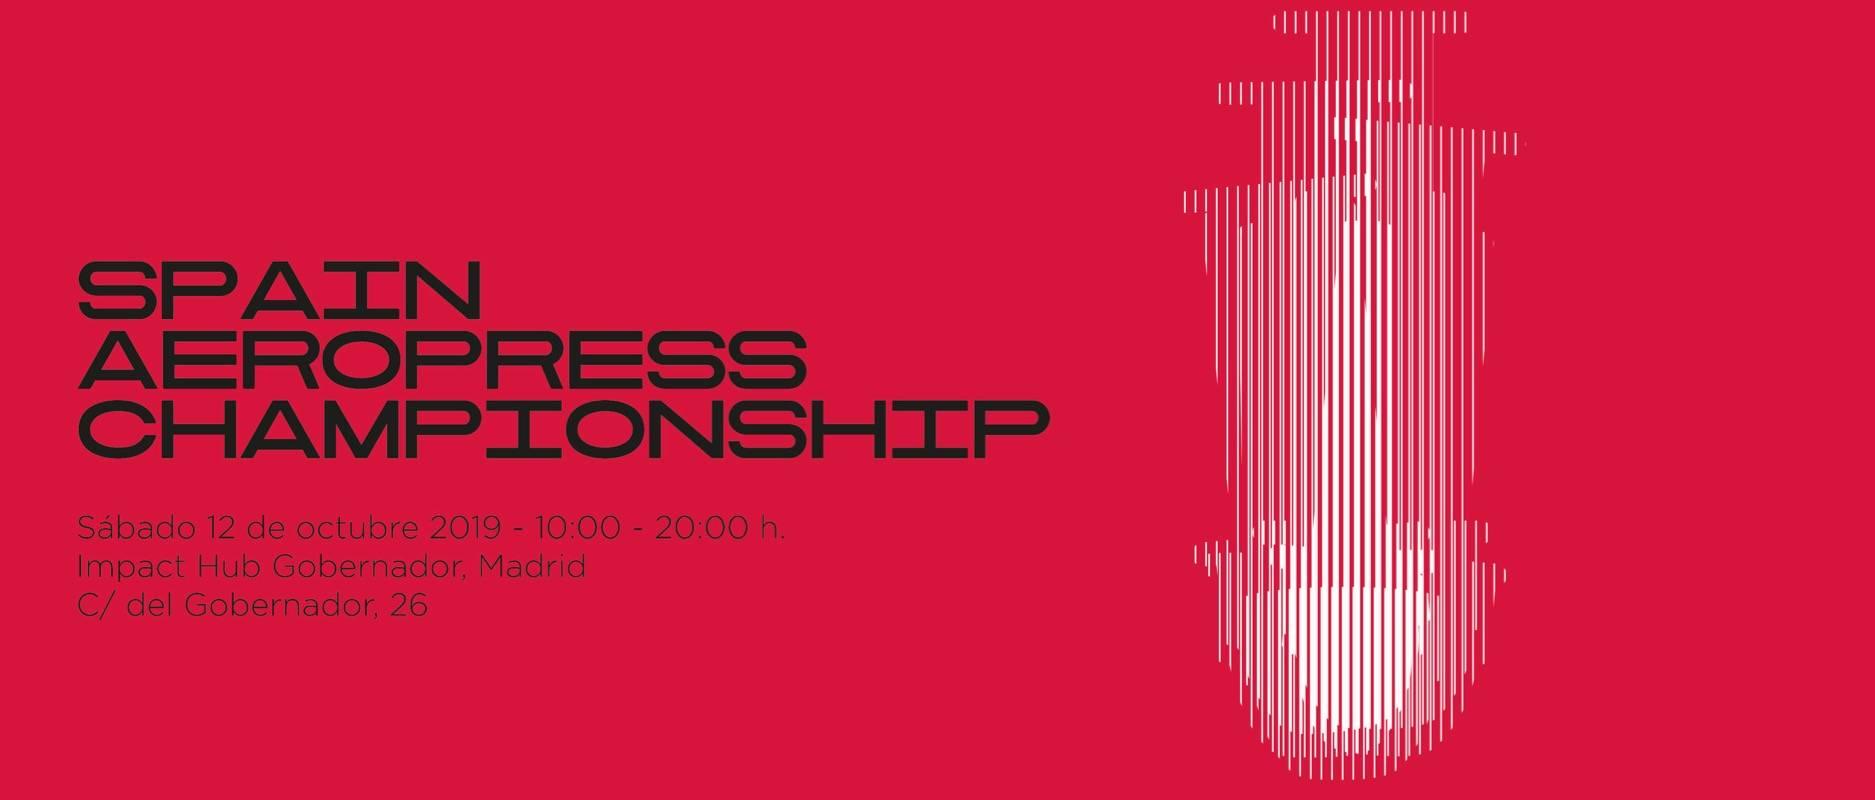 Spain AeroPress Championship Banner